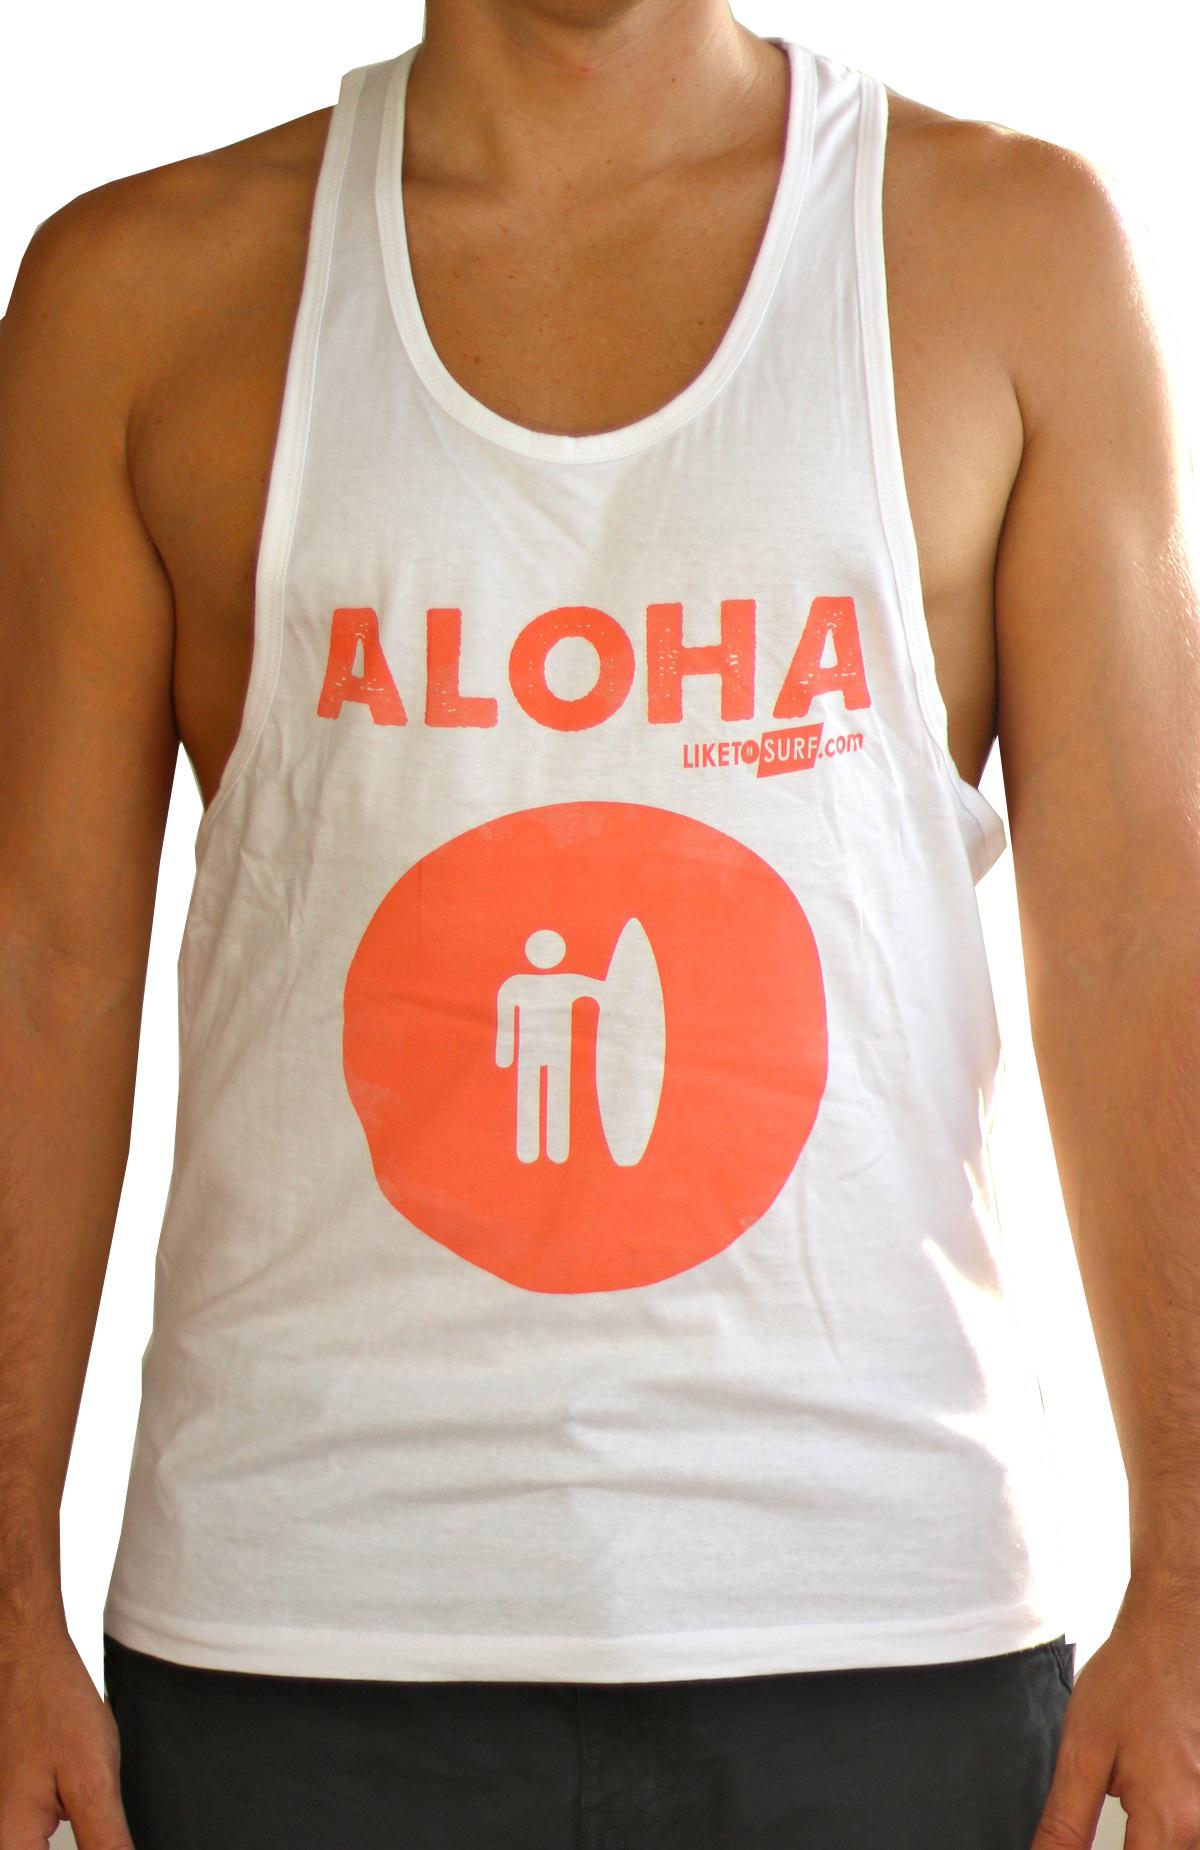 Like to Surf - Marca de Surf - Sudaderas - Camisetas - Gorras